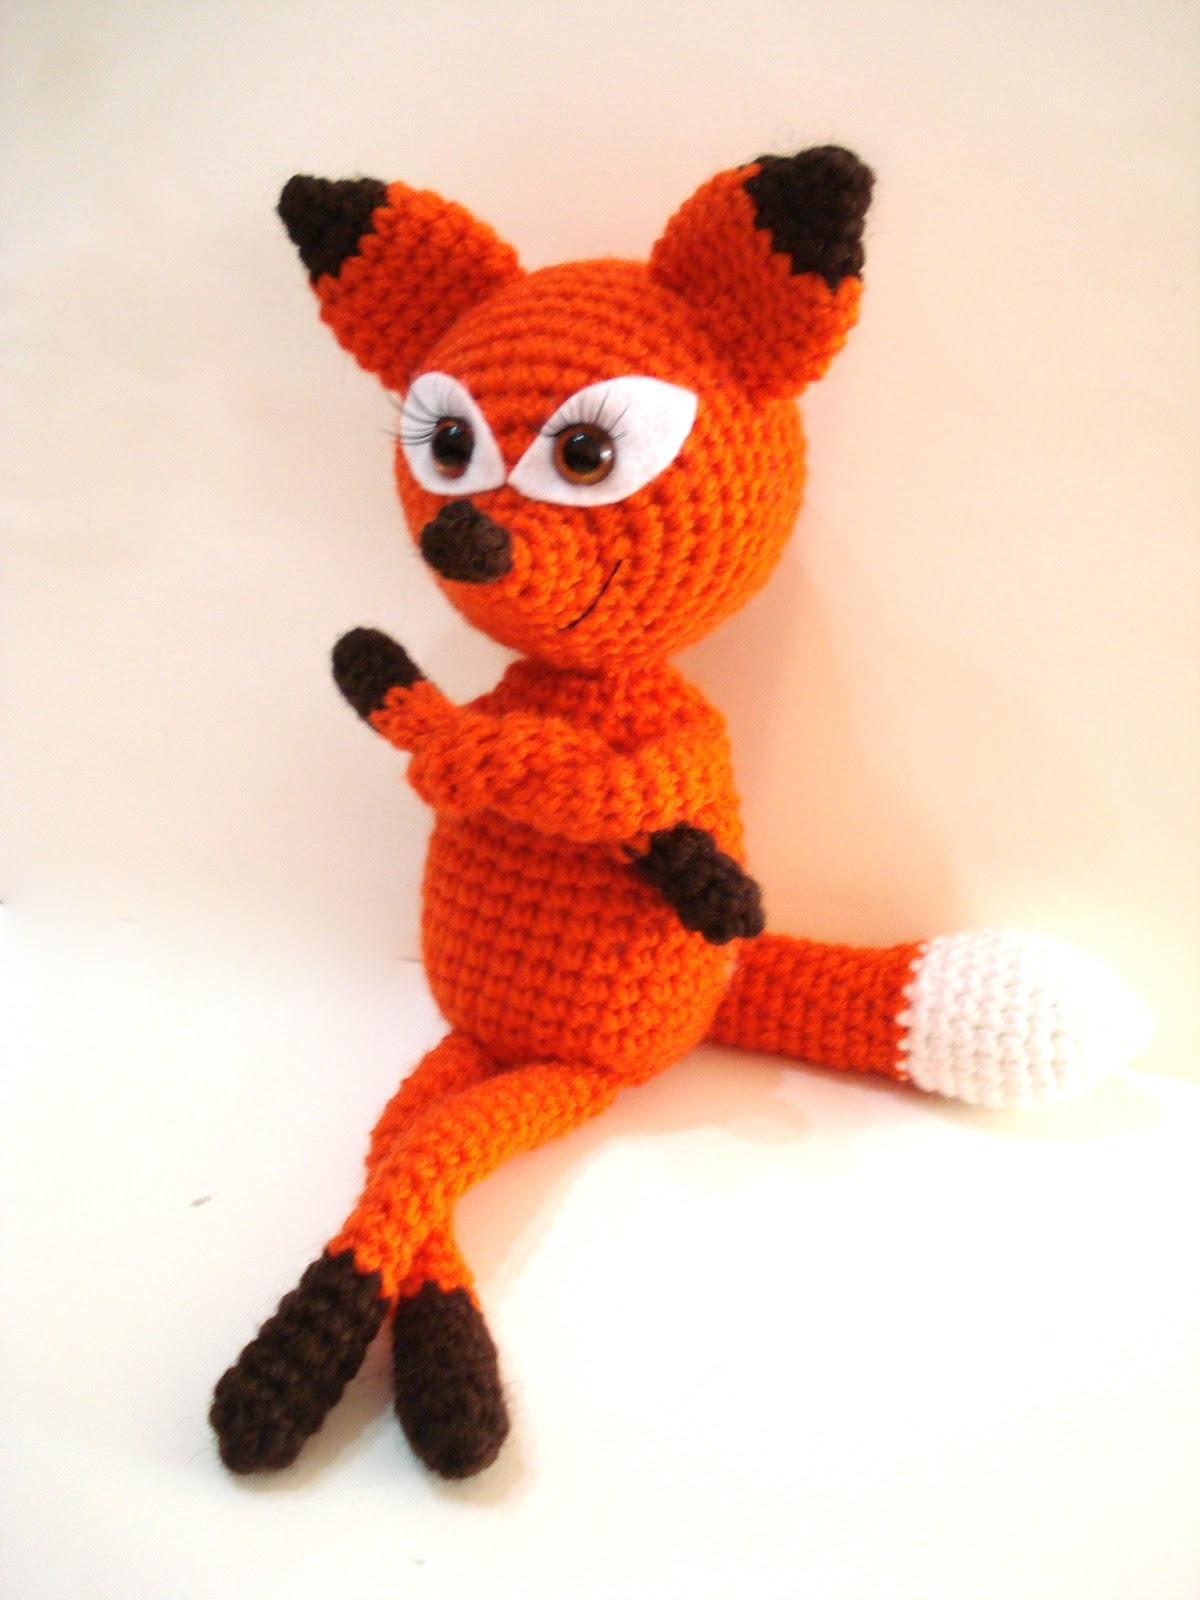 Crochet Fox : AllSoCute Amigurumis: Amigurumi Fox, Crochet Fox Pattern